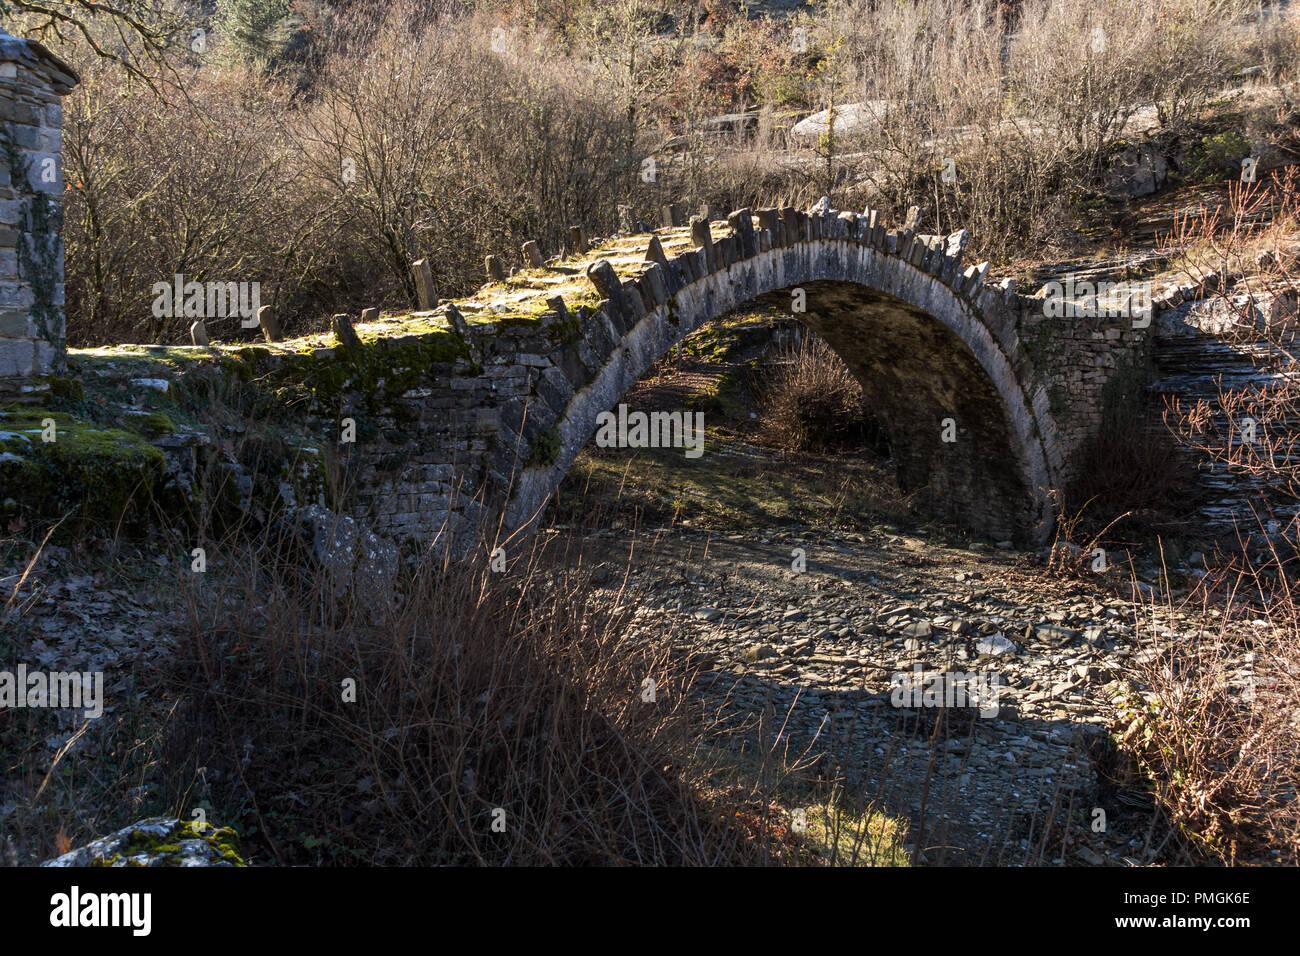 Amazing landscape of Captains Arkoudas Bridge, Pindus Mountains, Zagori, Epirus, Greece - Stock Image